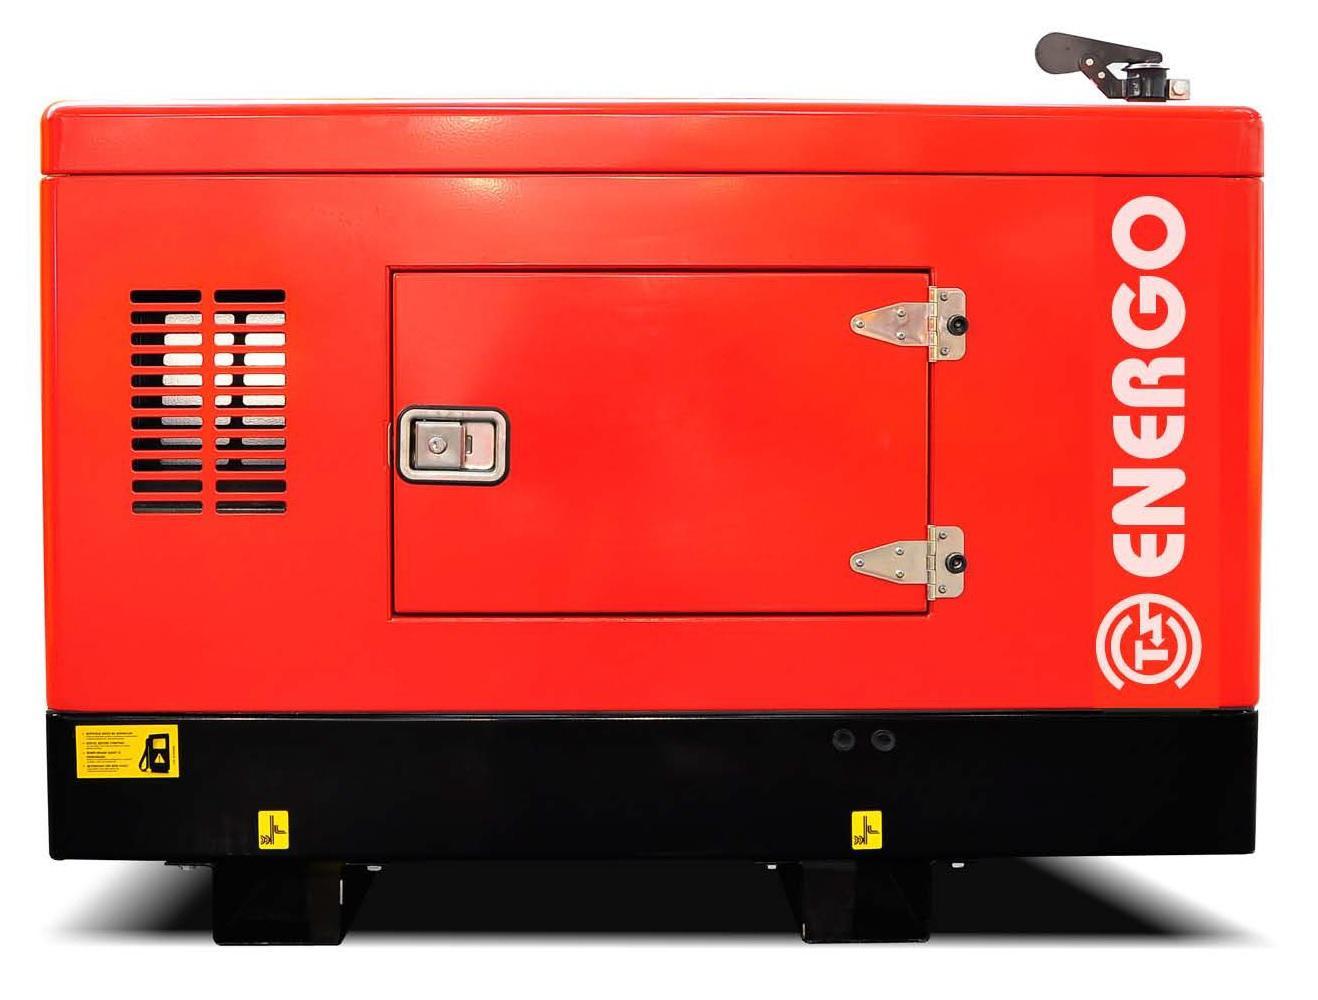 Дизельный генератор Energo Ed 35/400 y-ss (23130) 7411 ed aa hhba ss